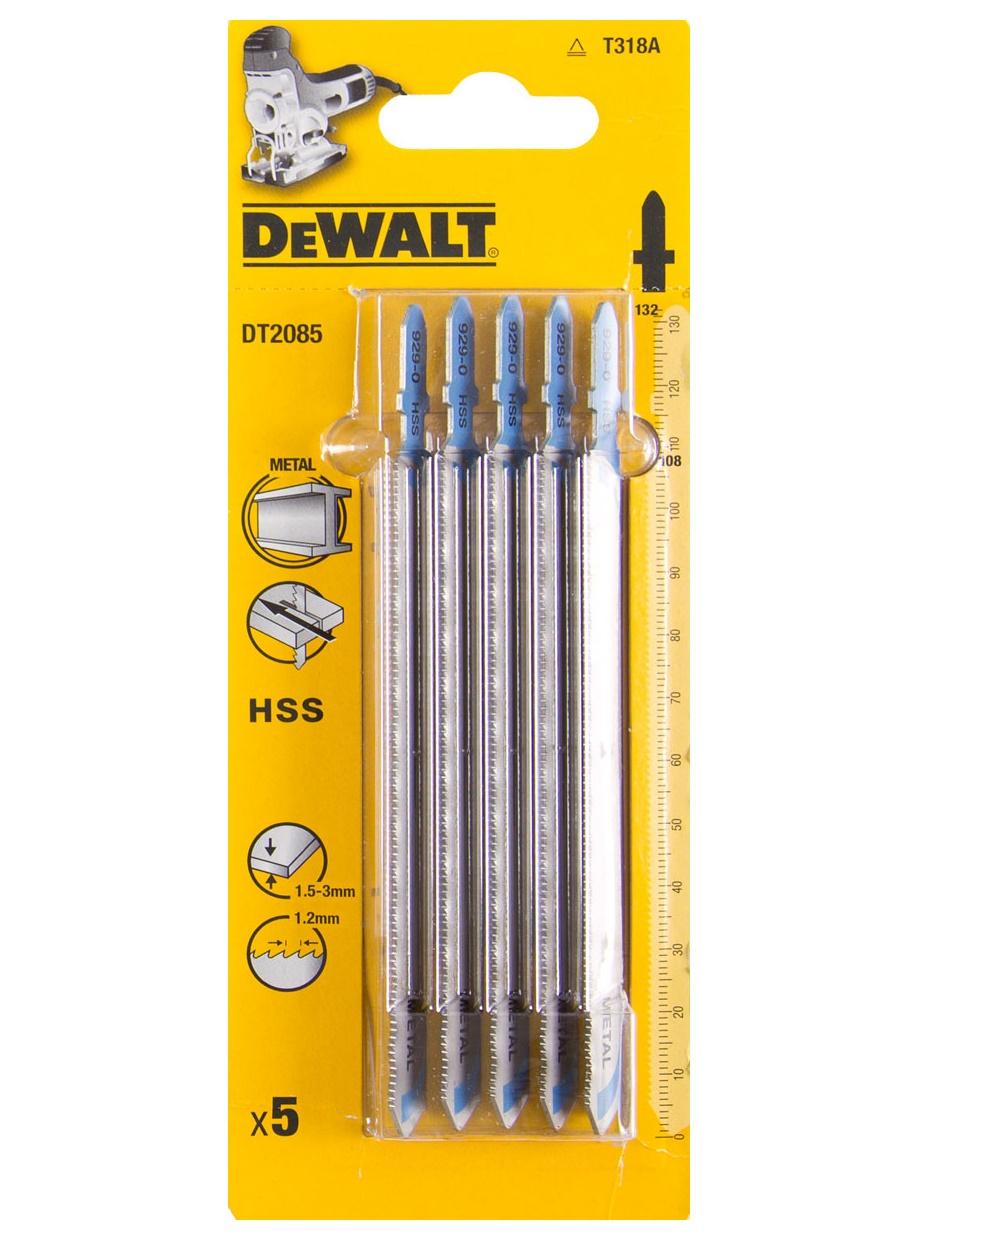 DT2051 DeWALT pilový plátek HCS 132 mm na dřevo 5ks